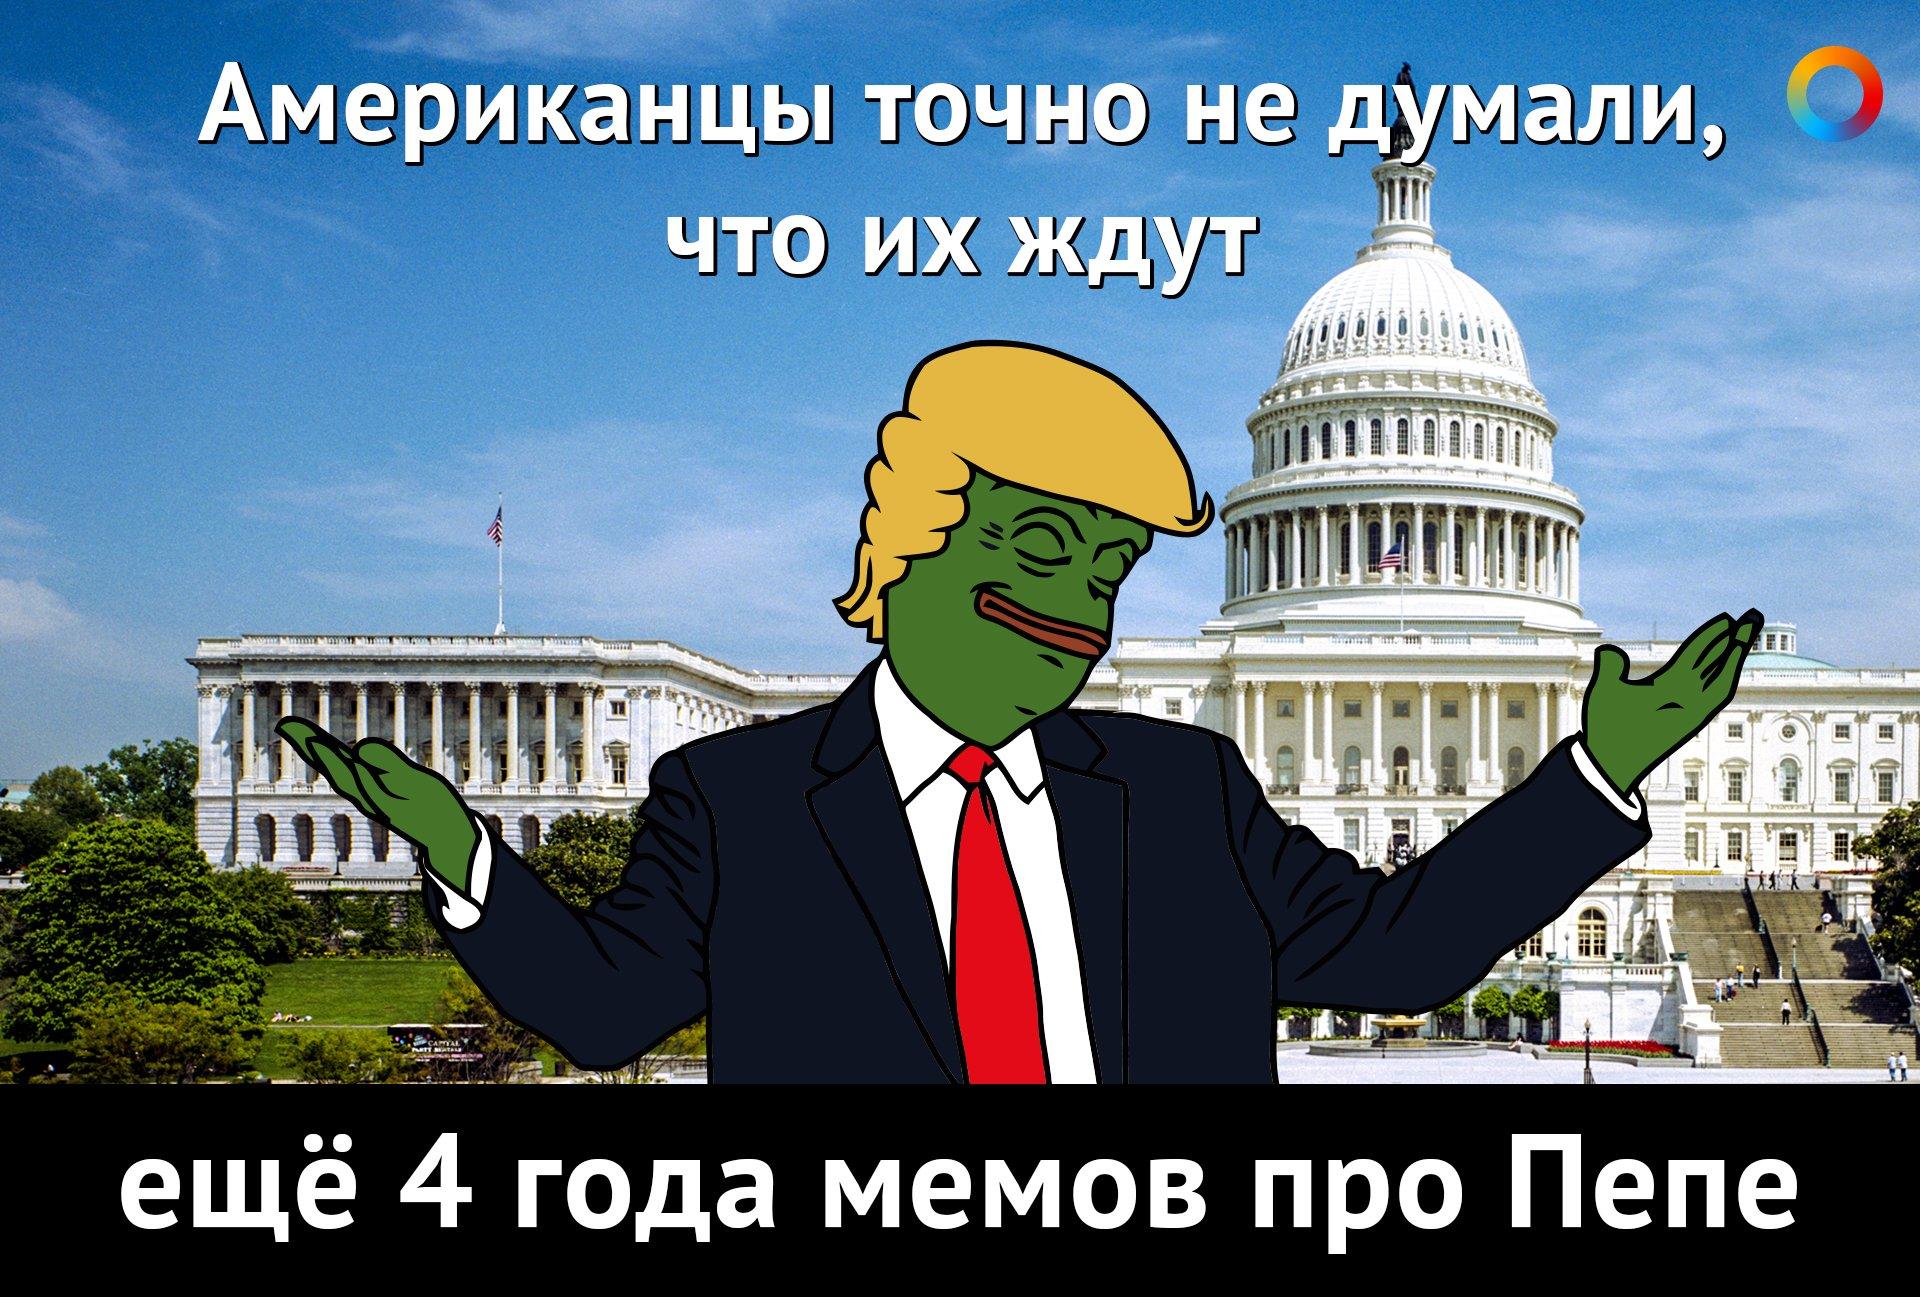 Make America meme again! - Изображение 1